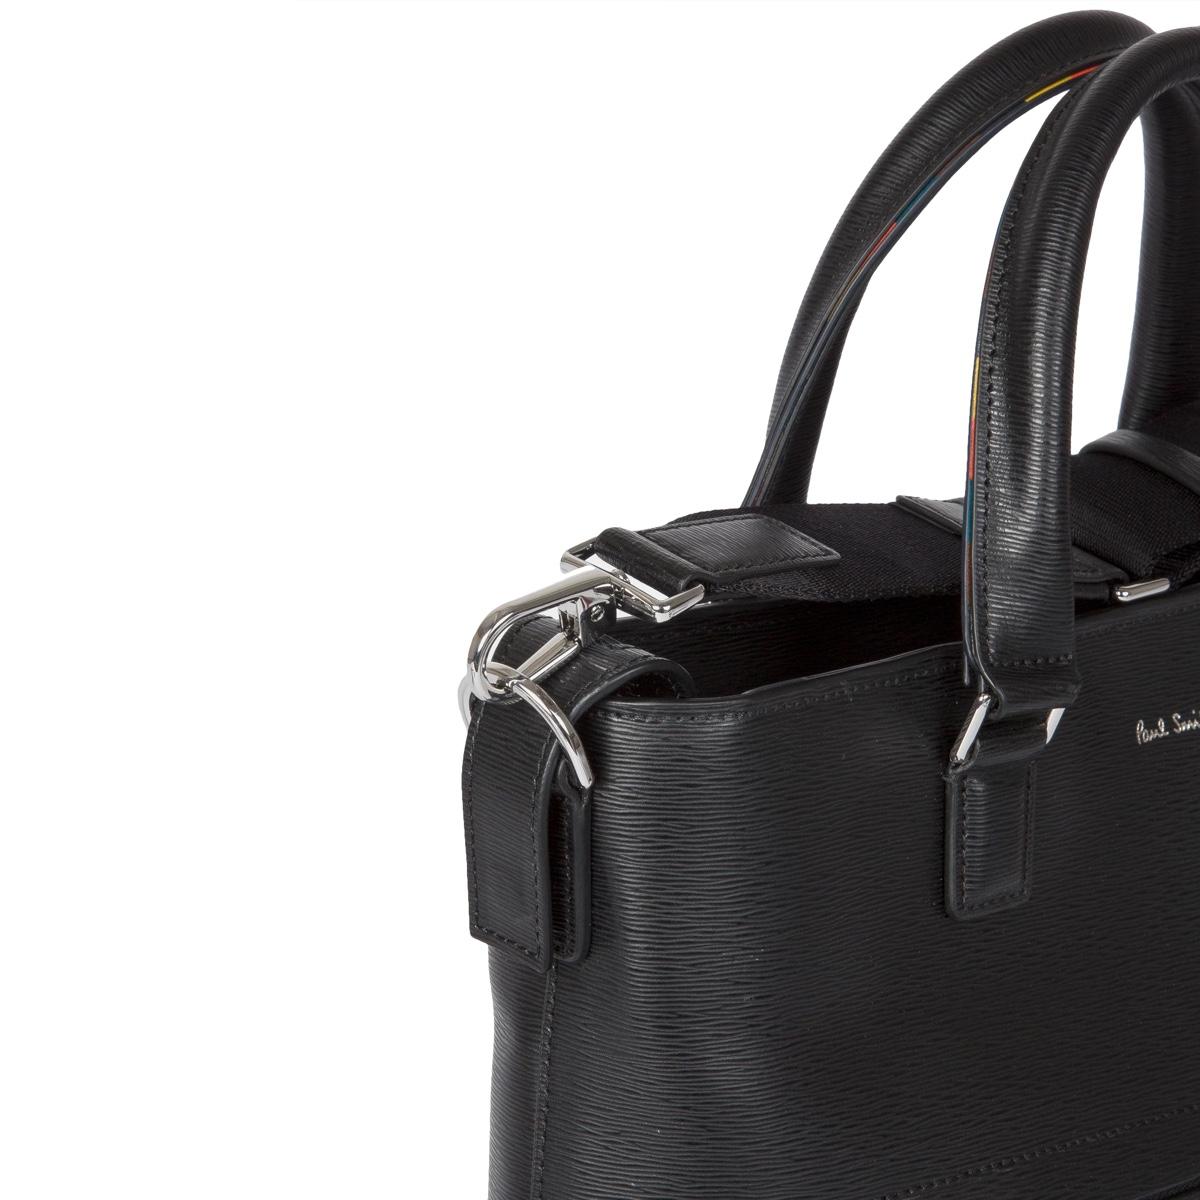 paul-smith-Black-Black-Embossed-Leather-Tote-Bag-With-bright-Stripe-Trim (5).jpg